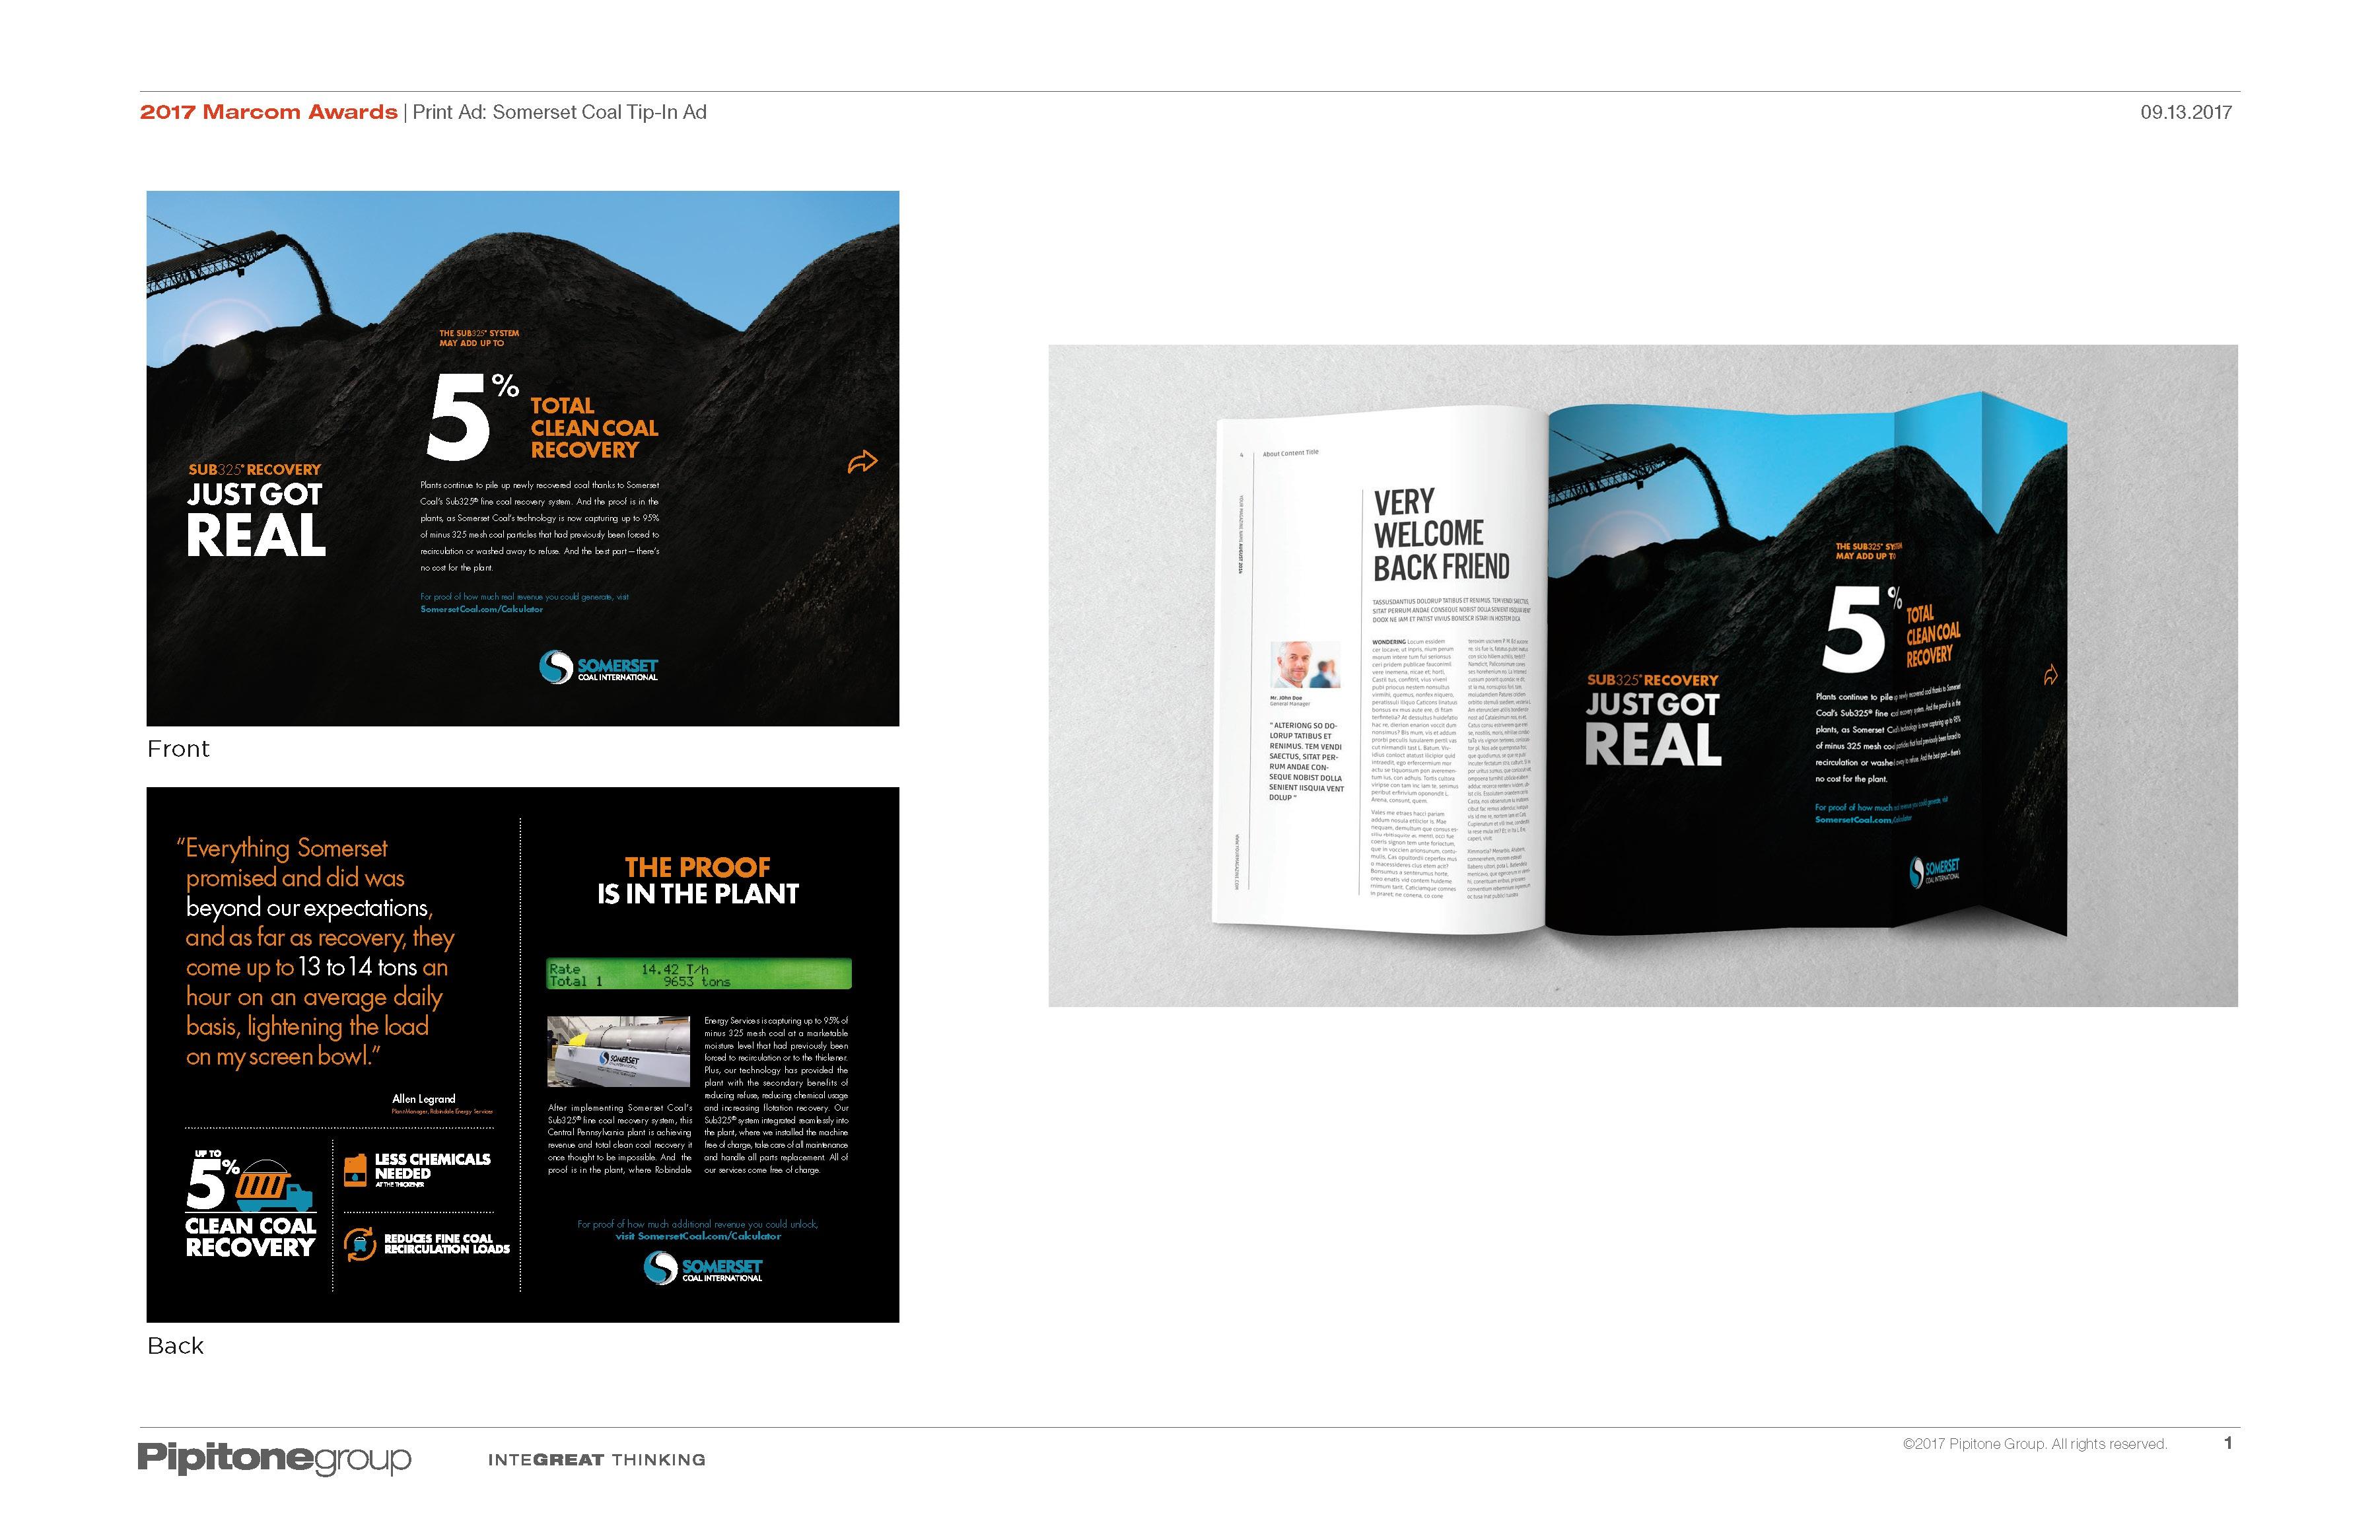 2017 Marcom Awards - Print Ad - Somerset Coal Tip-In Ad.jpg